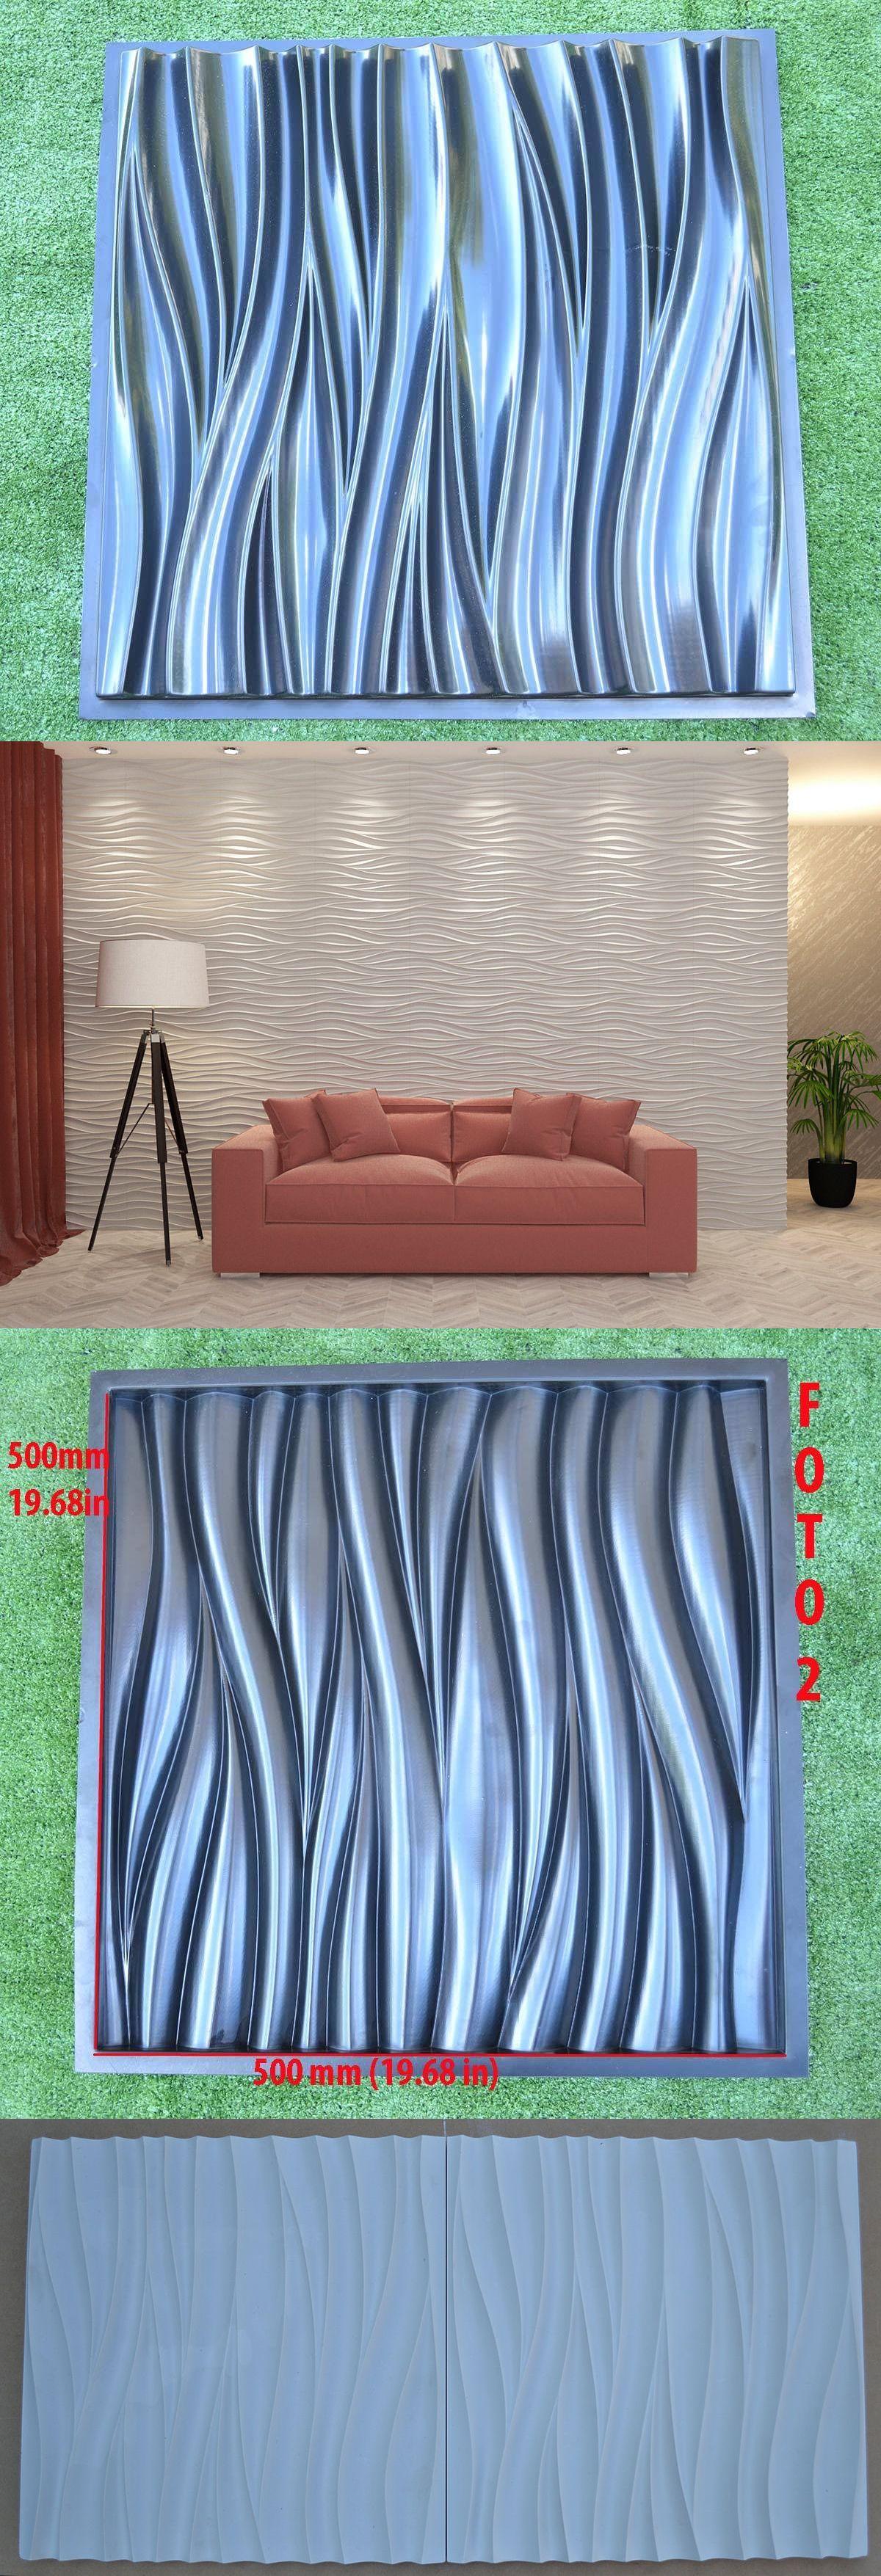 Fantastic Wall Tile Panel Composition - Bathtub Ideas - dilata.info